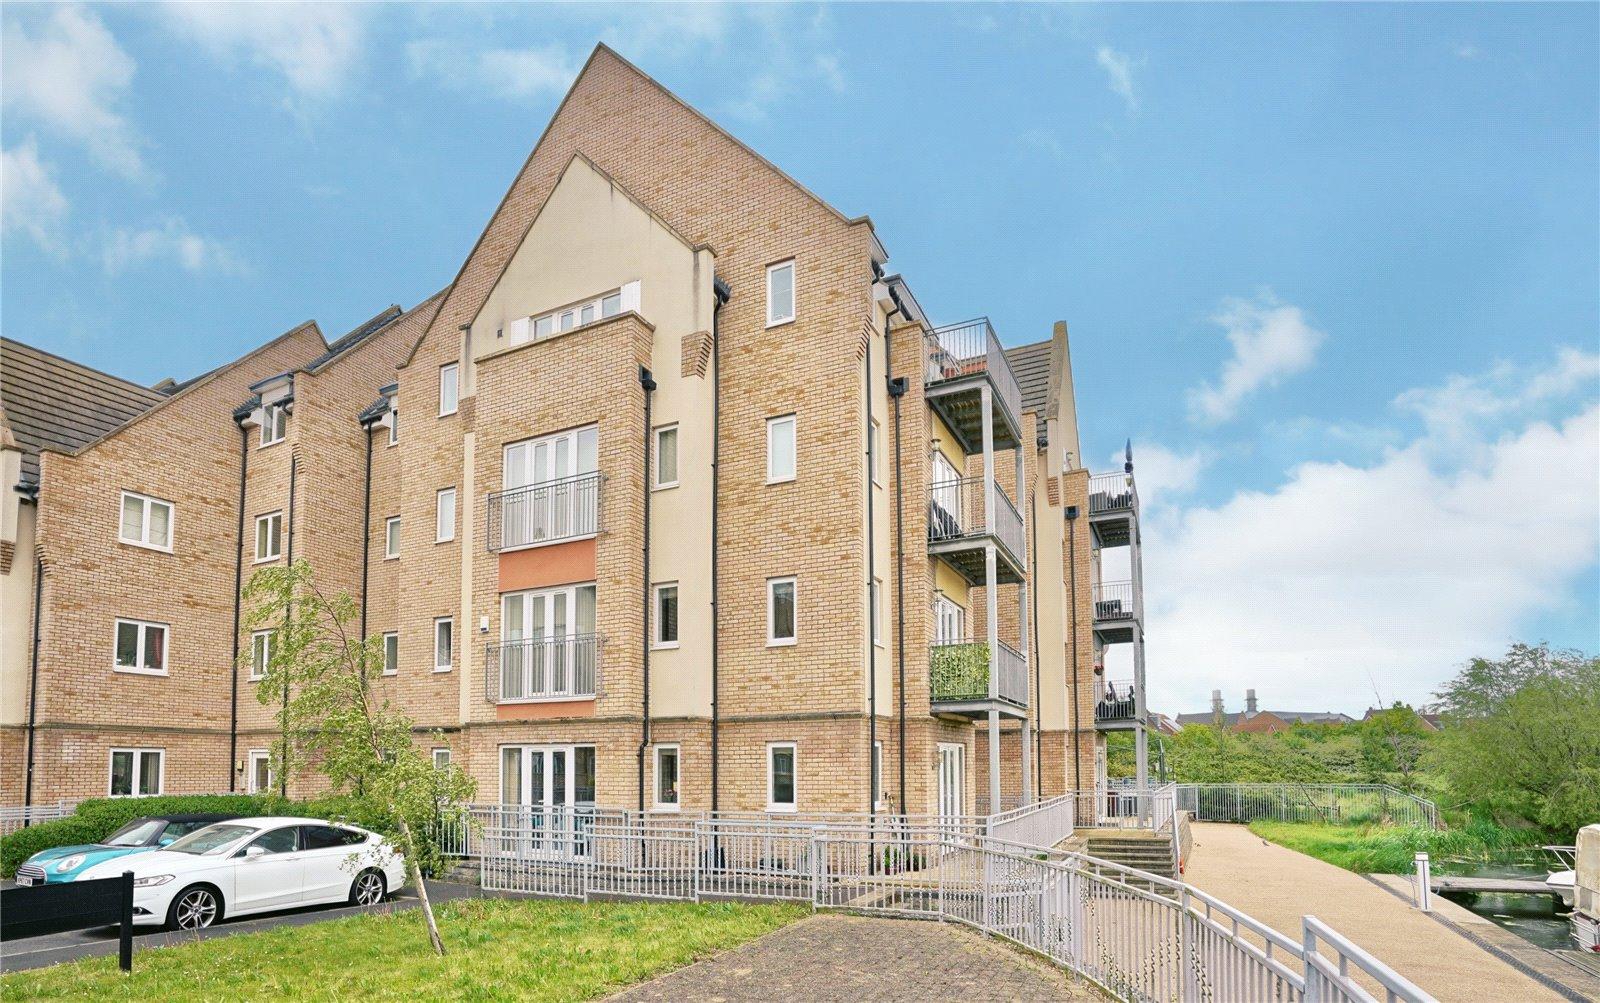 3 bed apartment for sale in Wren Walk, Eynesbury  - Property Image 1